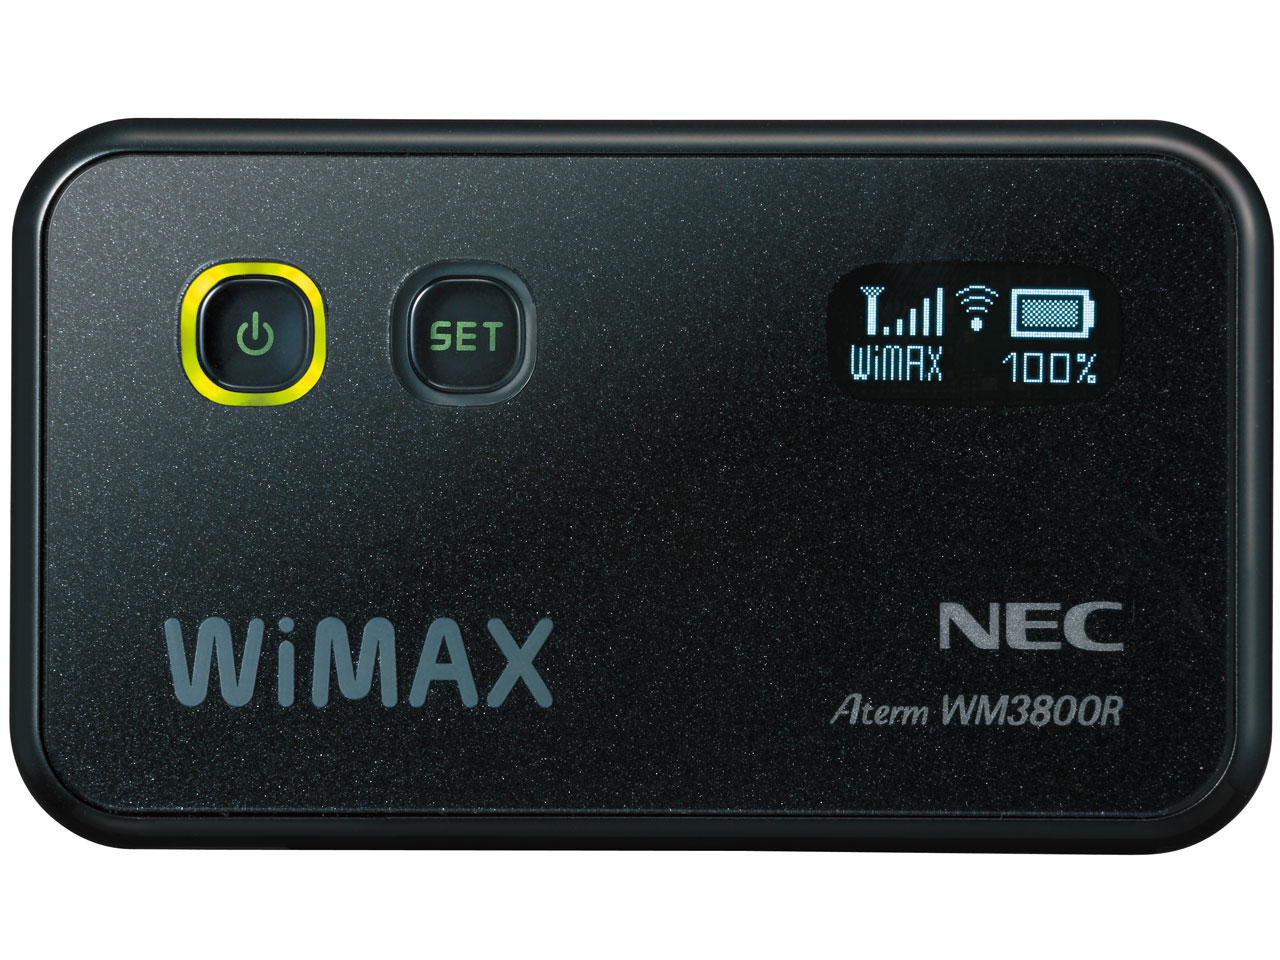 AtermWM3800R PA-WM3800R(AT)B [ブラック] の製品画像